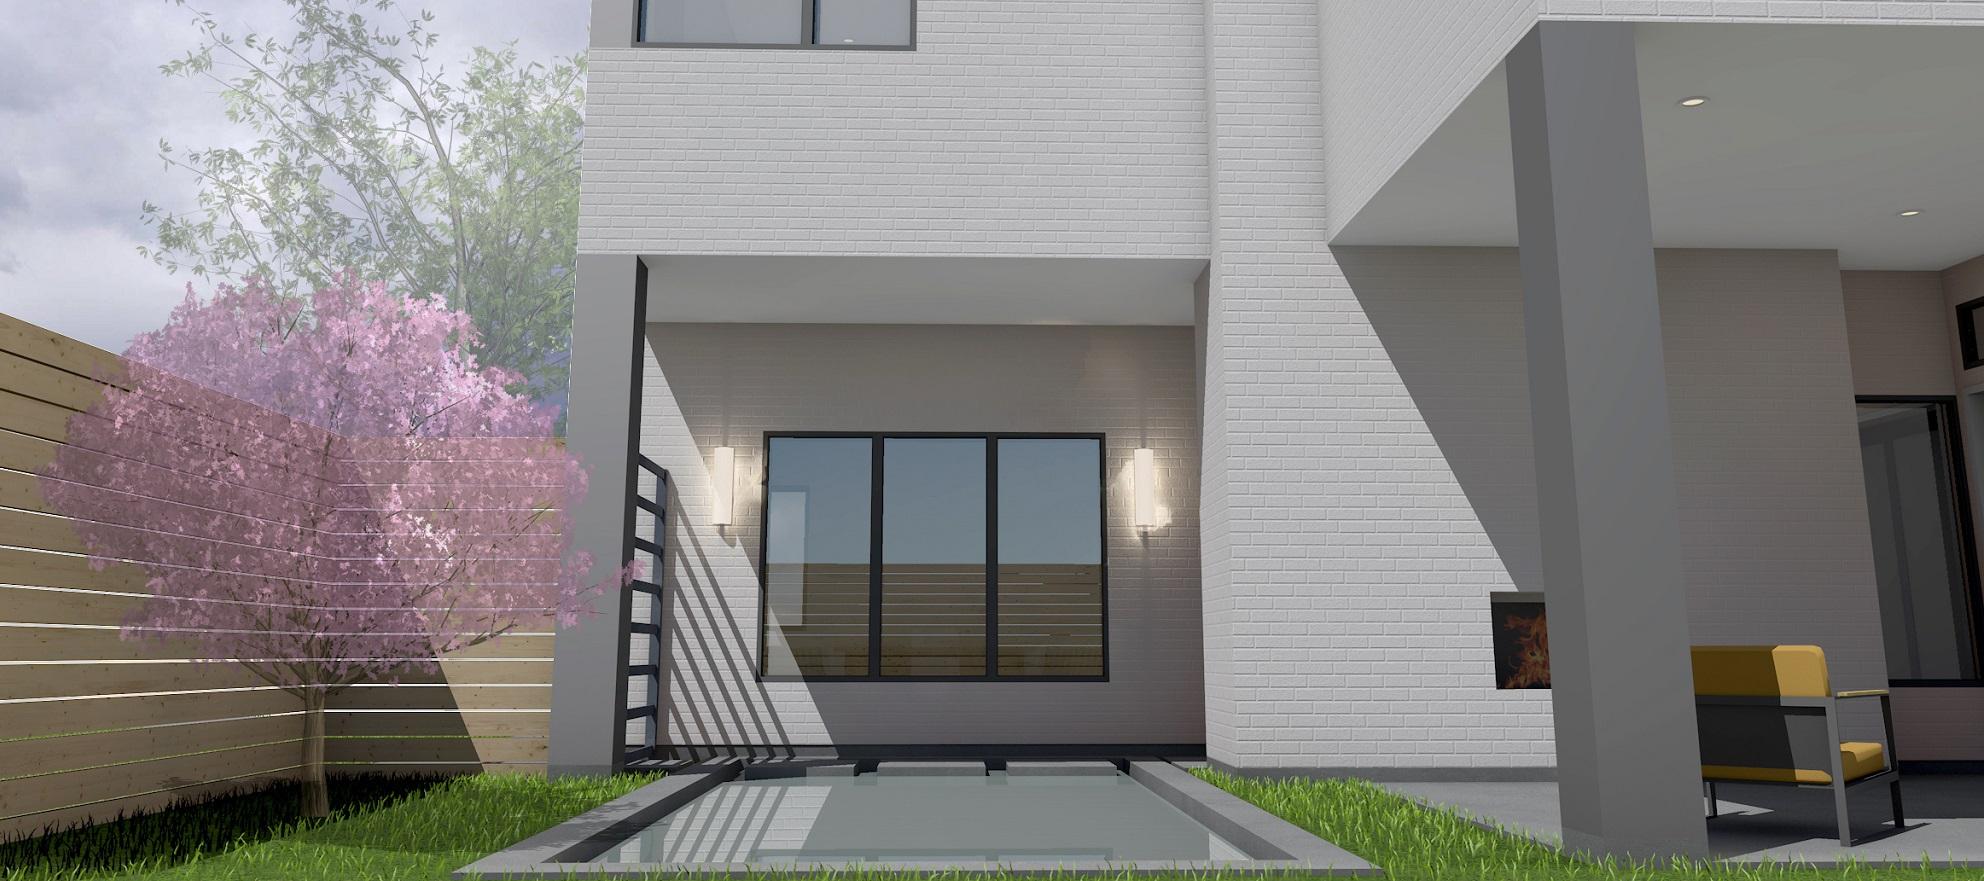 Development spotlight: modern construction in Upper Kirby